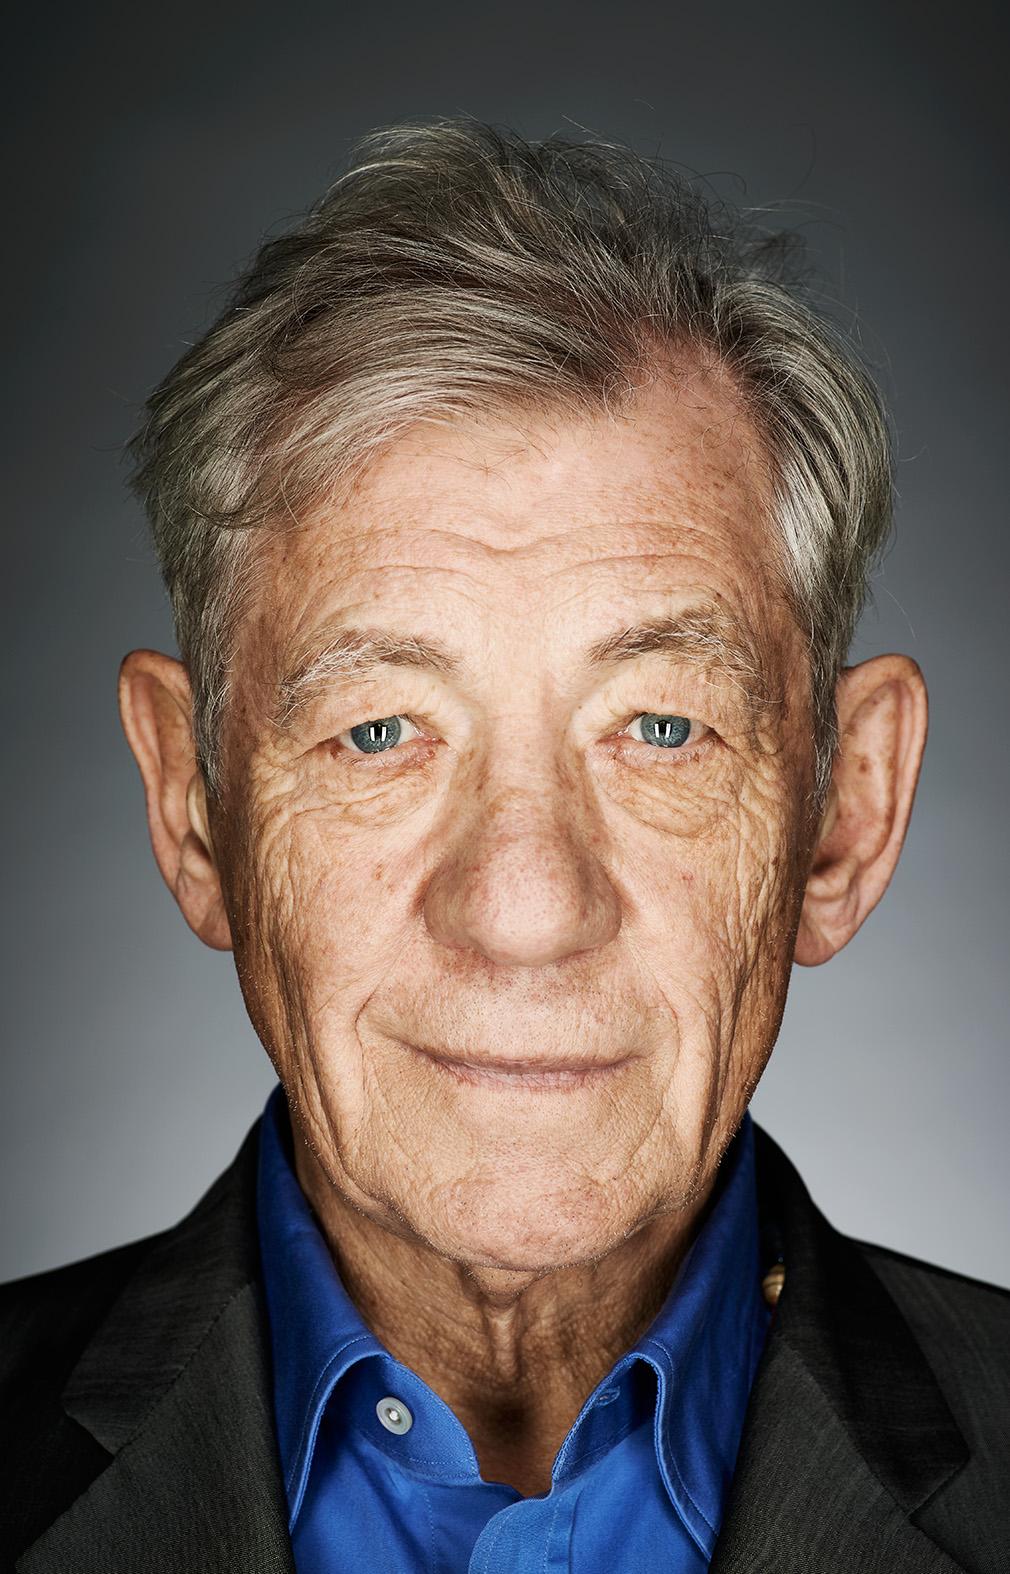 HQ Ian McKellen Wallpapers | File 488.87Kb